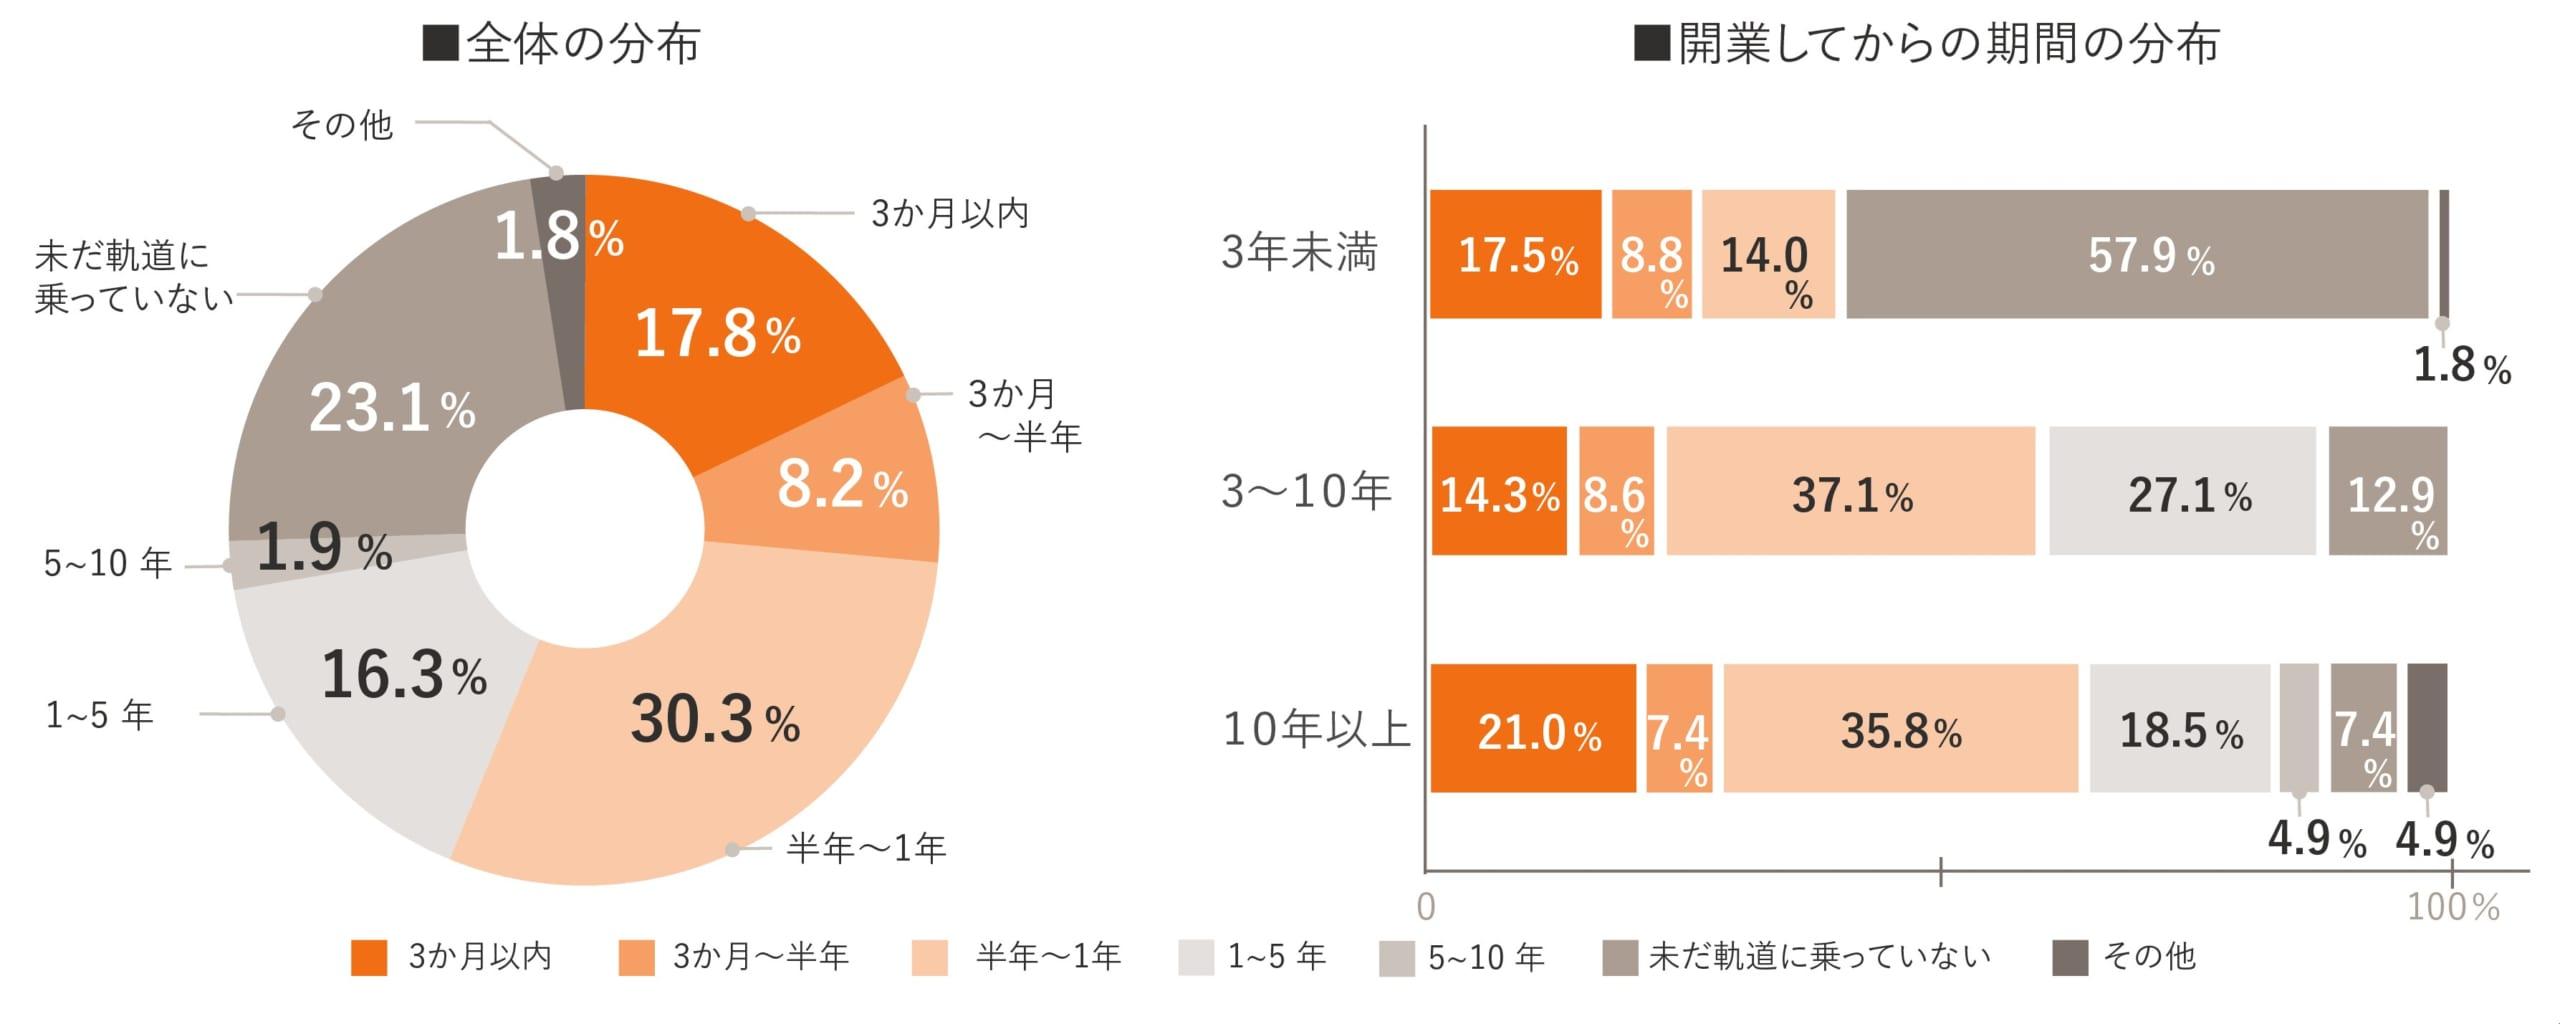 独立開業実態調査グラフ03